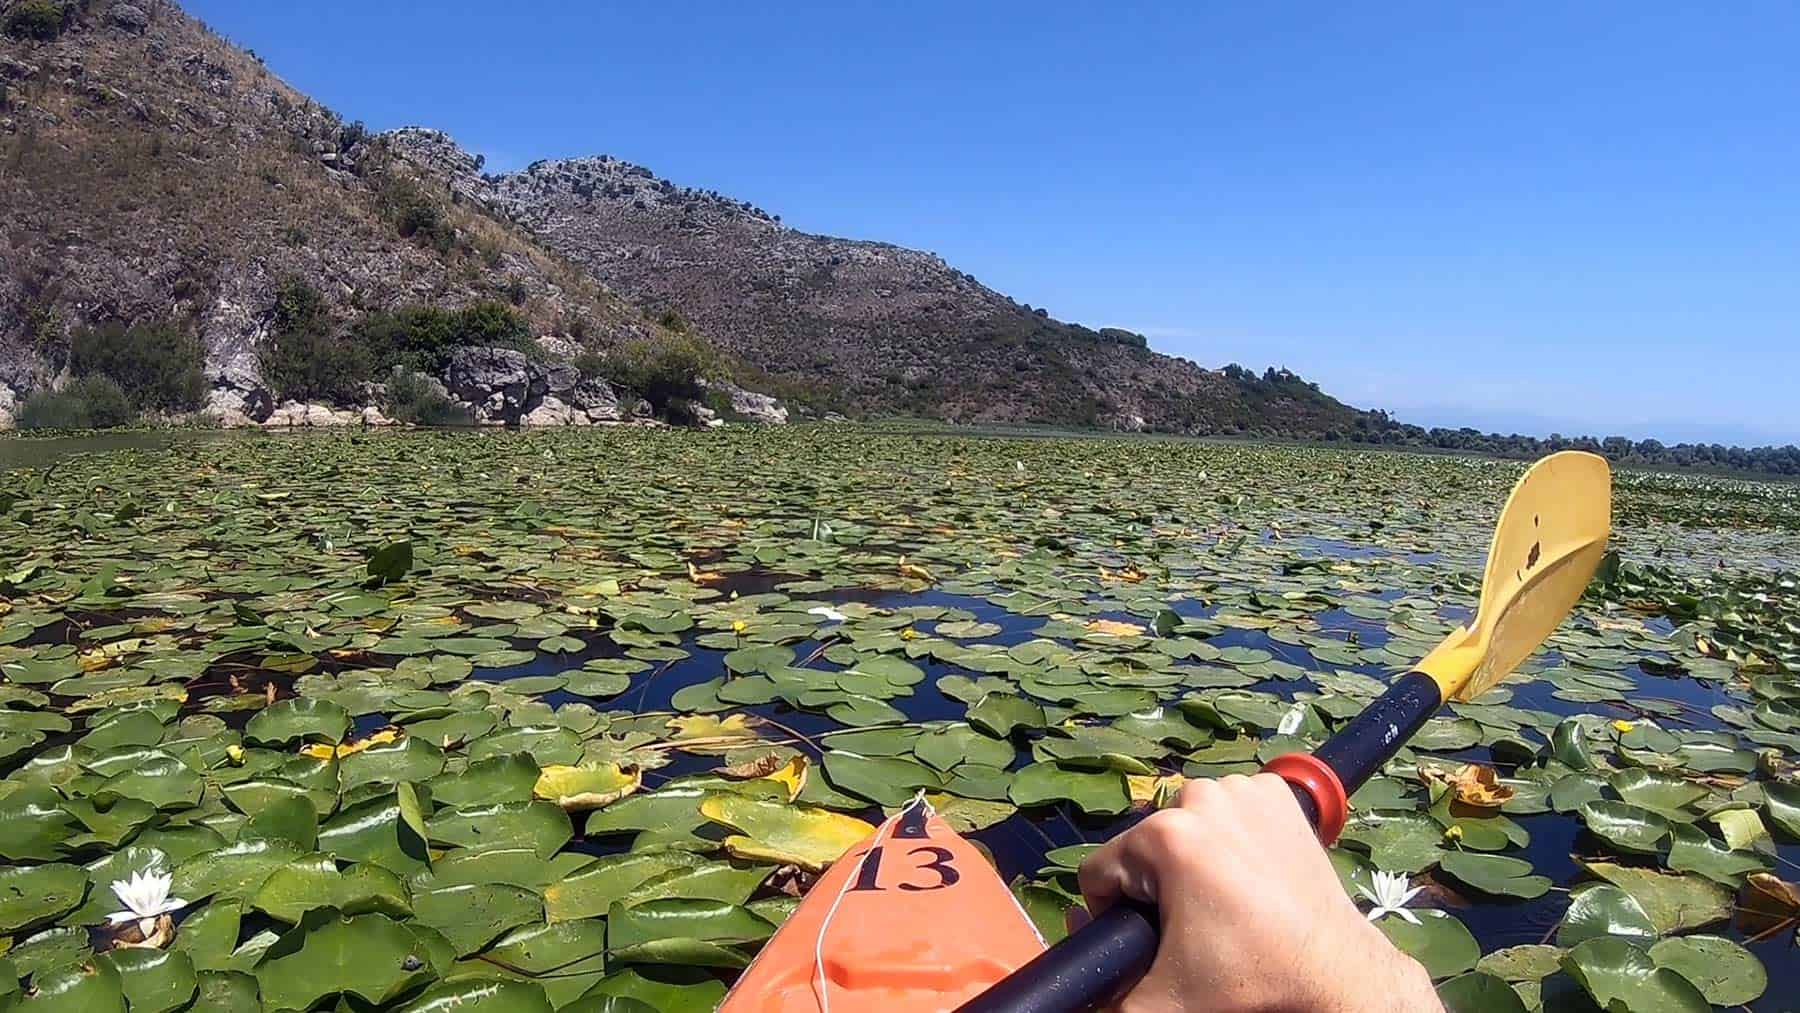 Kayak on Skadar Lake at a sunny day